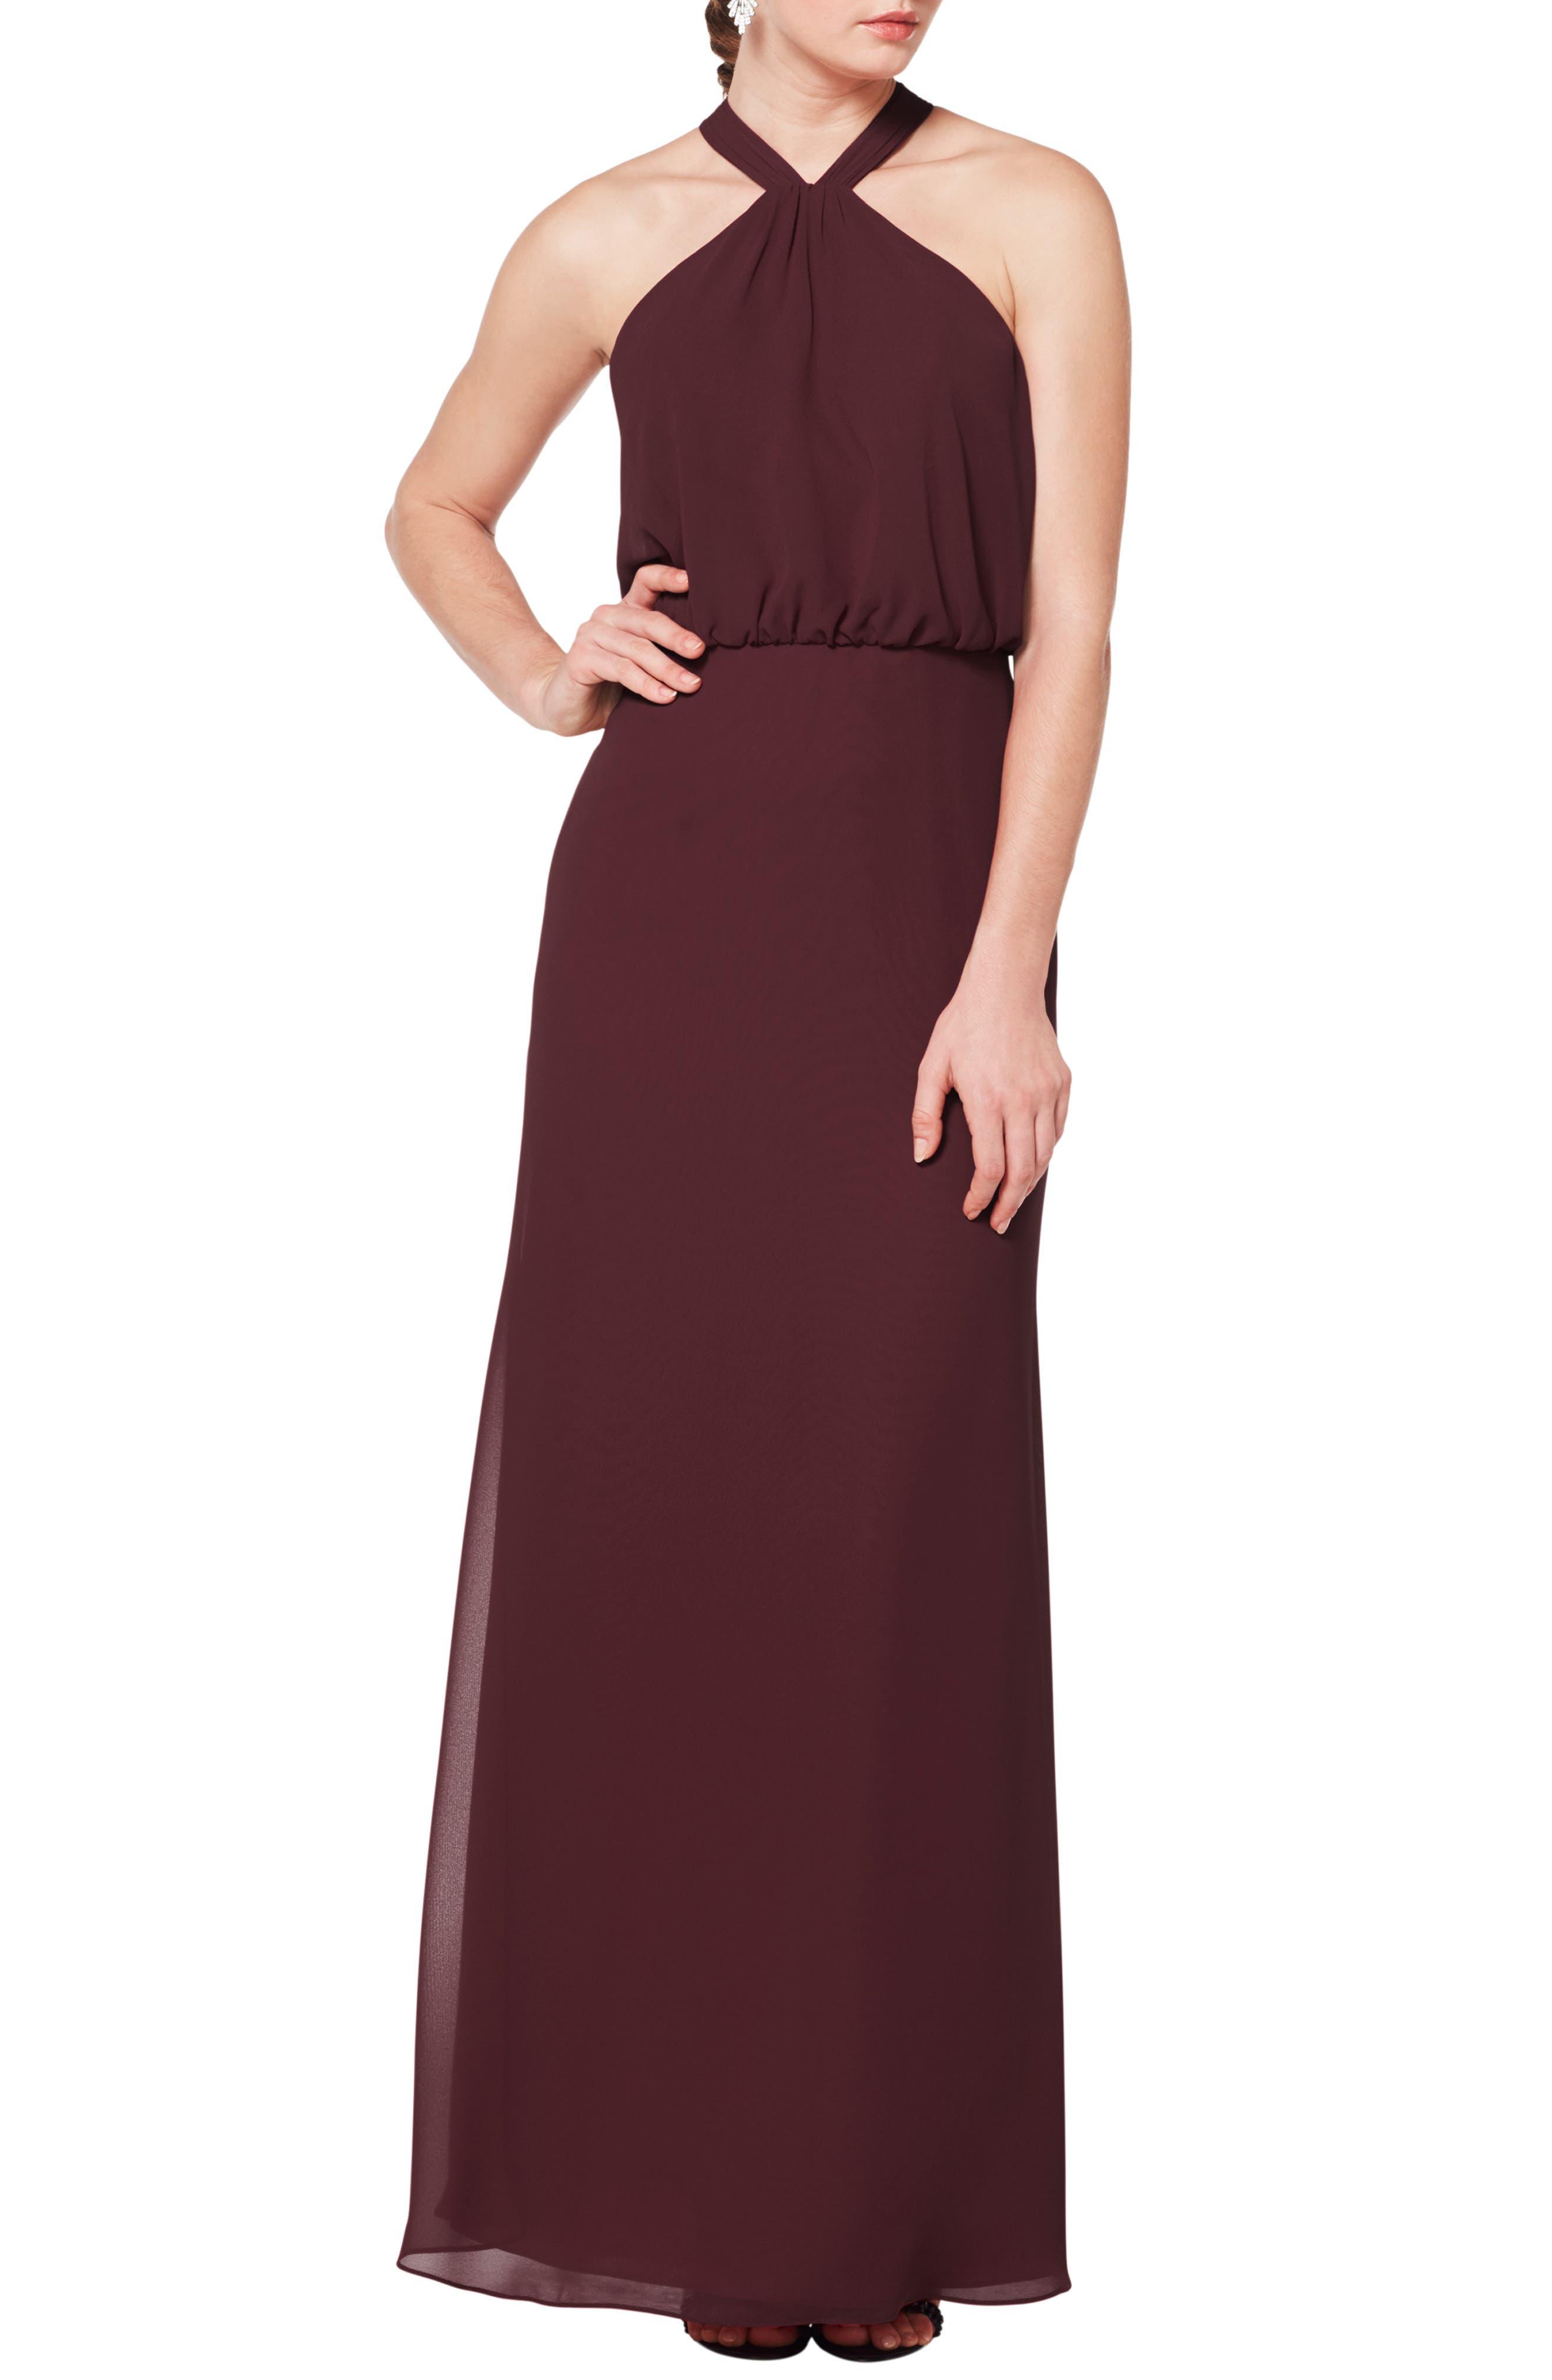 #levkoff Halter Neck Blouson Bodice Evening Dress, Burgundy